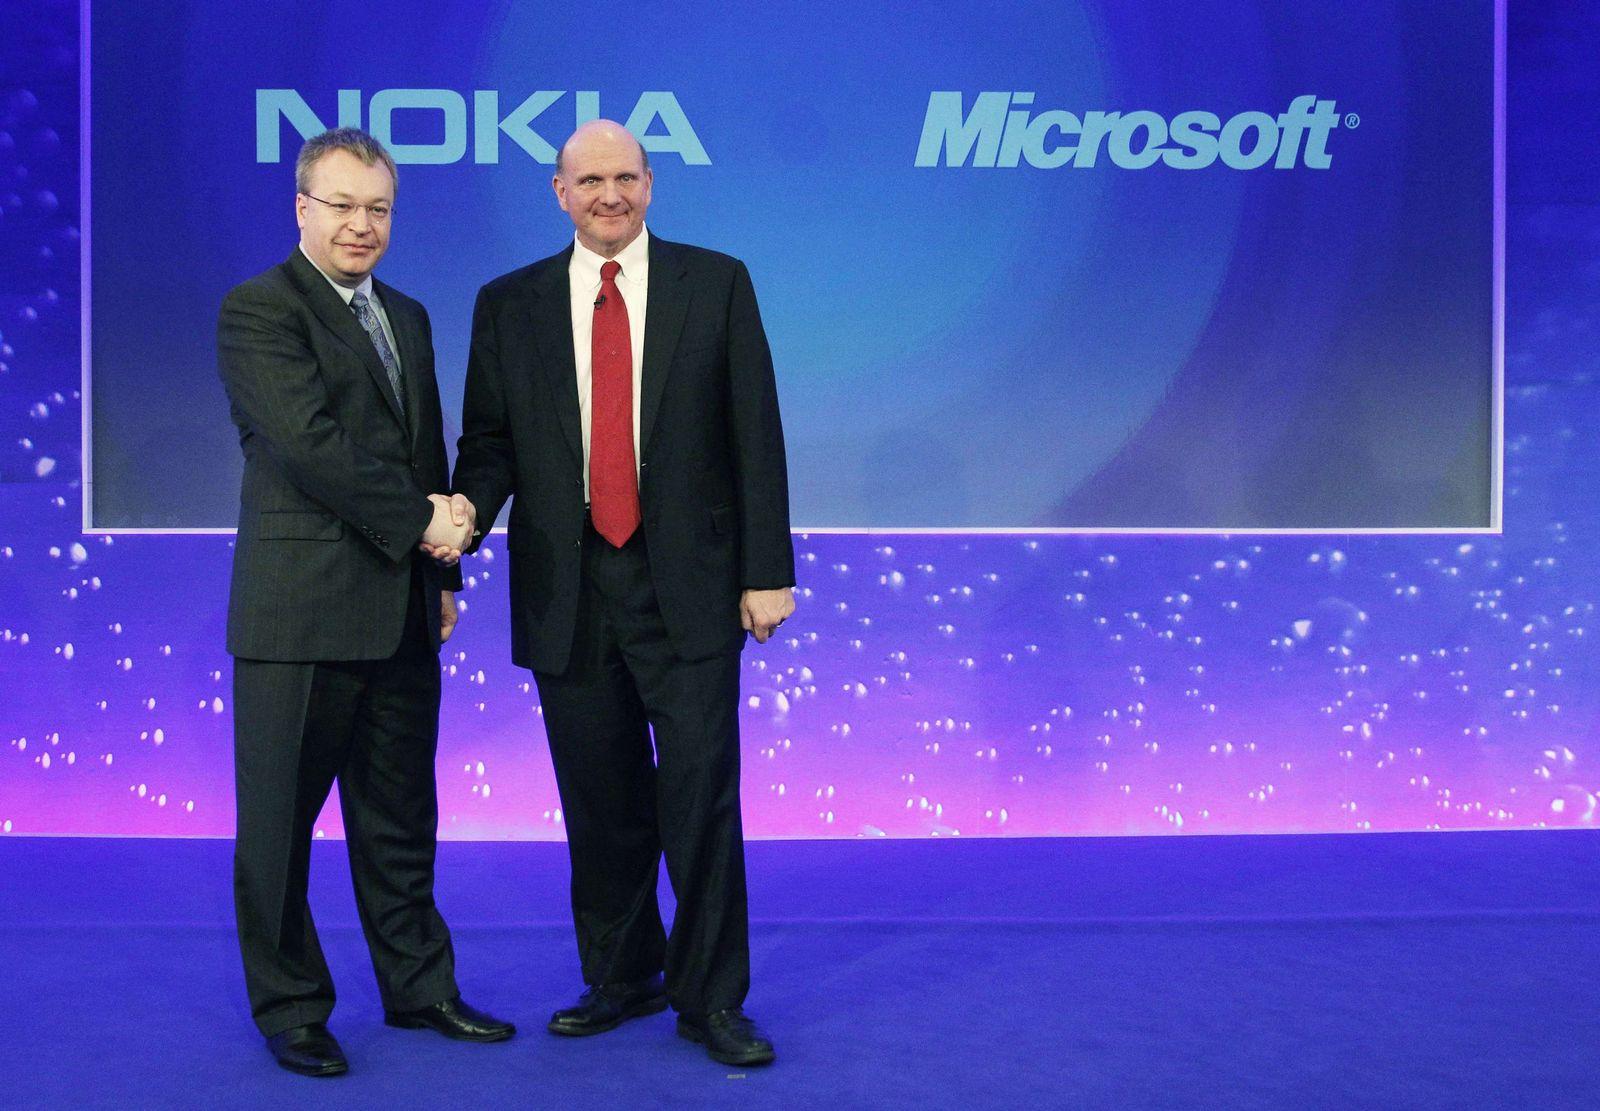 Microsoft Nokia Steve Ballmer Stephen Elop